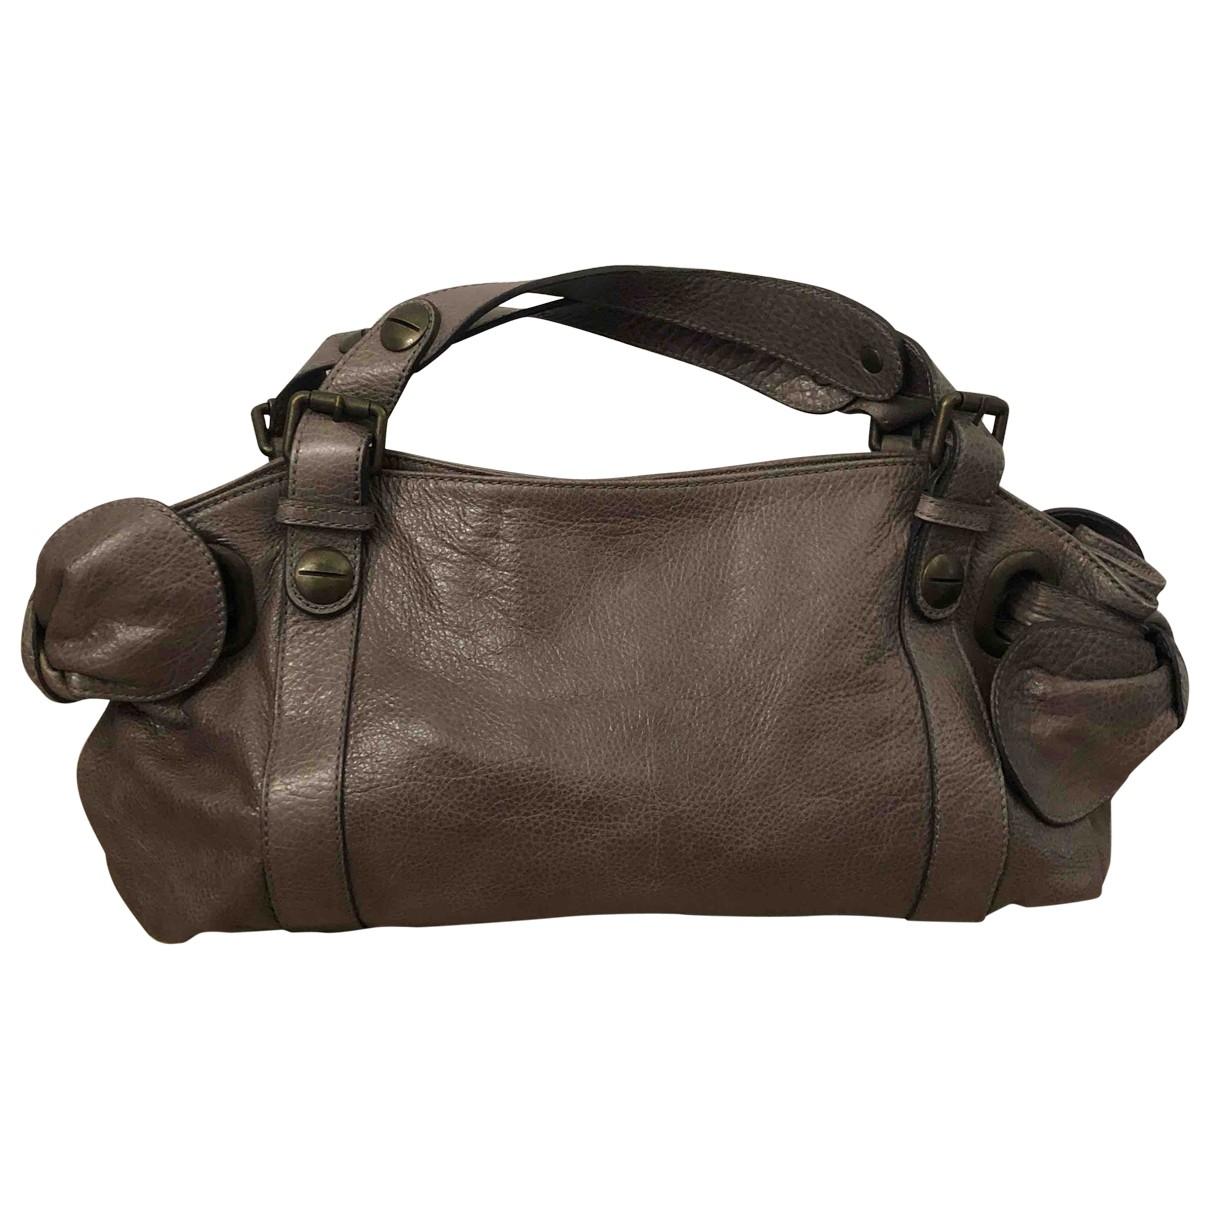 Gerard Darel \N Handtasche in  Beige Leder